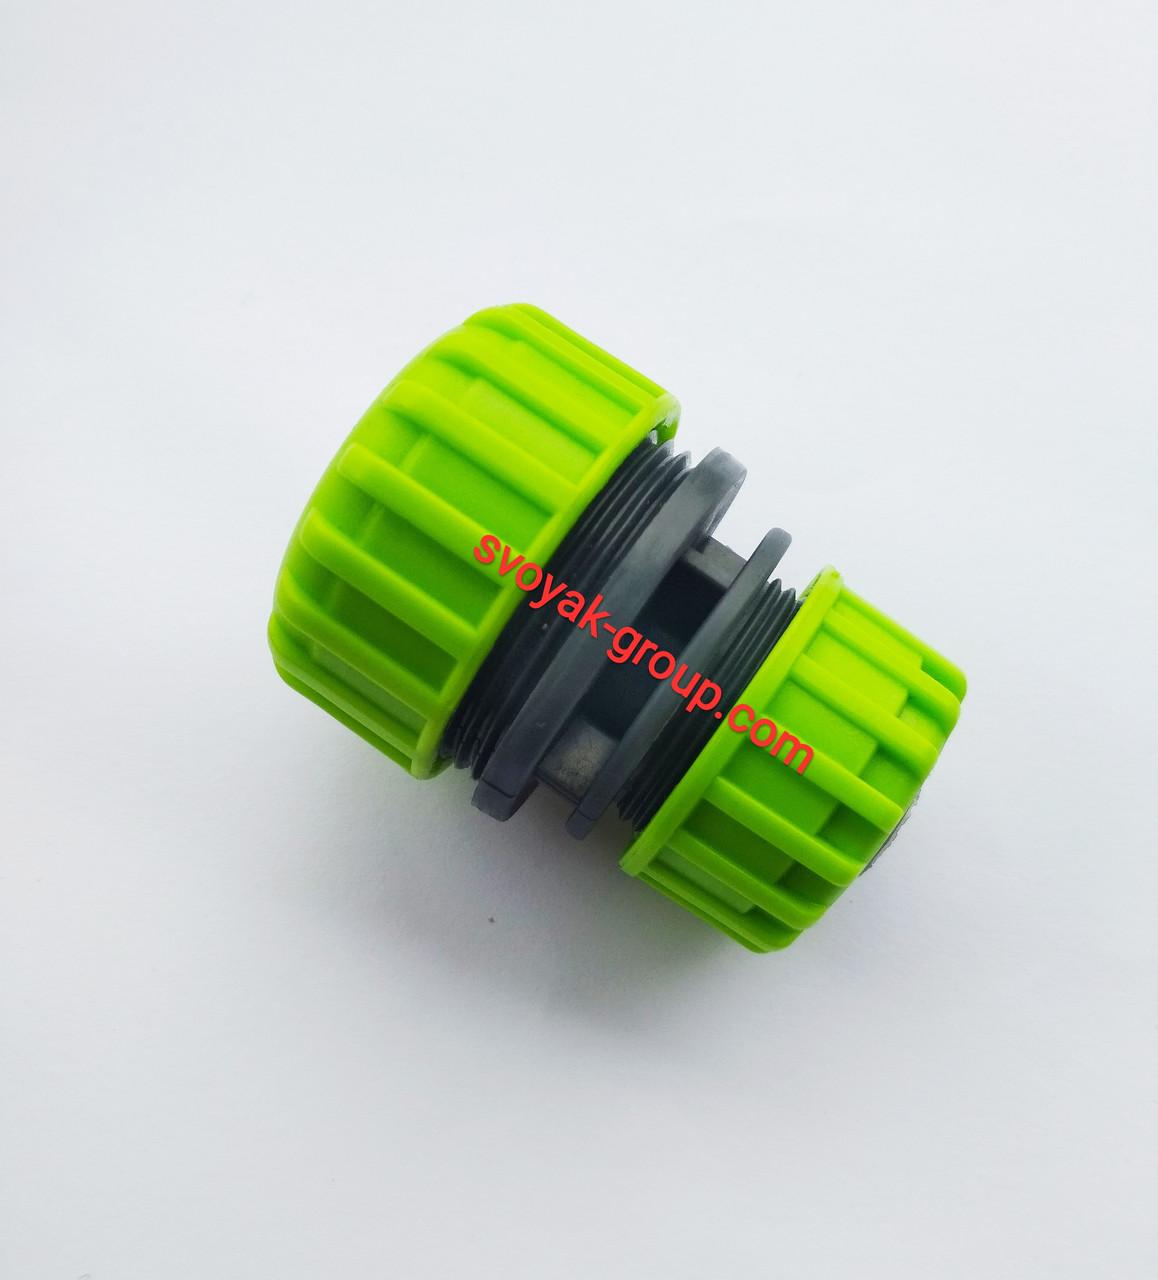 "Соединение для шланга 1/2"" - 3/4"" дюйма ""Presto PS"" - 5708 (orange, green)., фото 1"